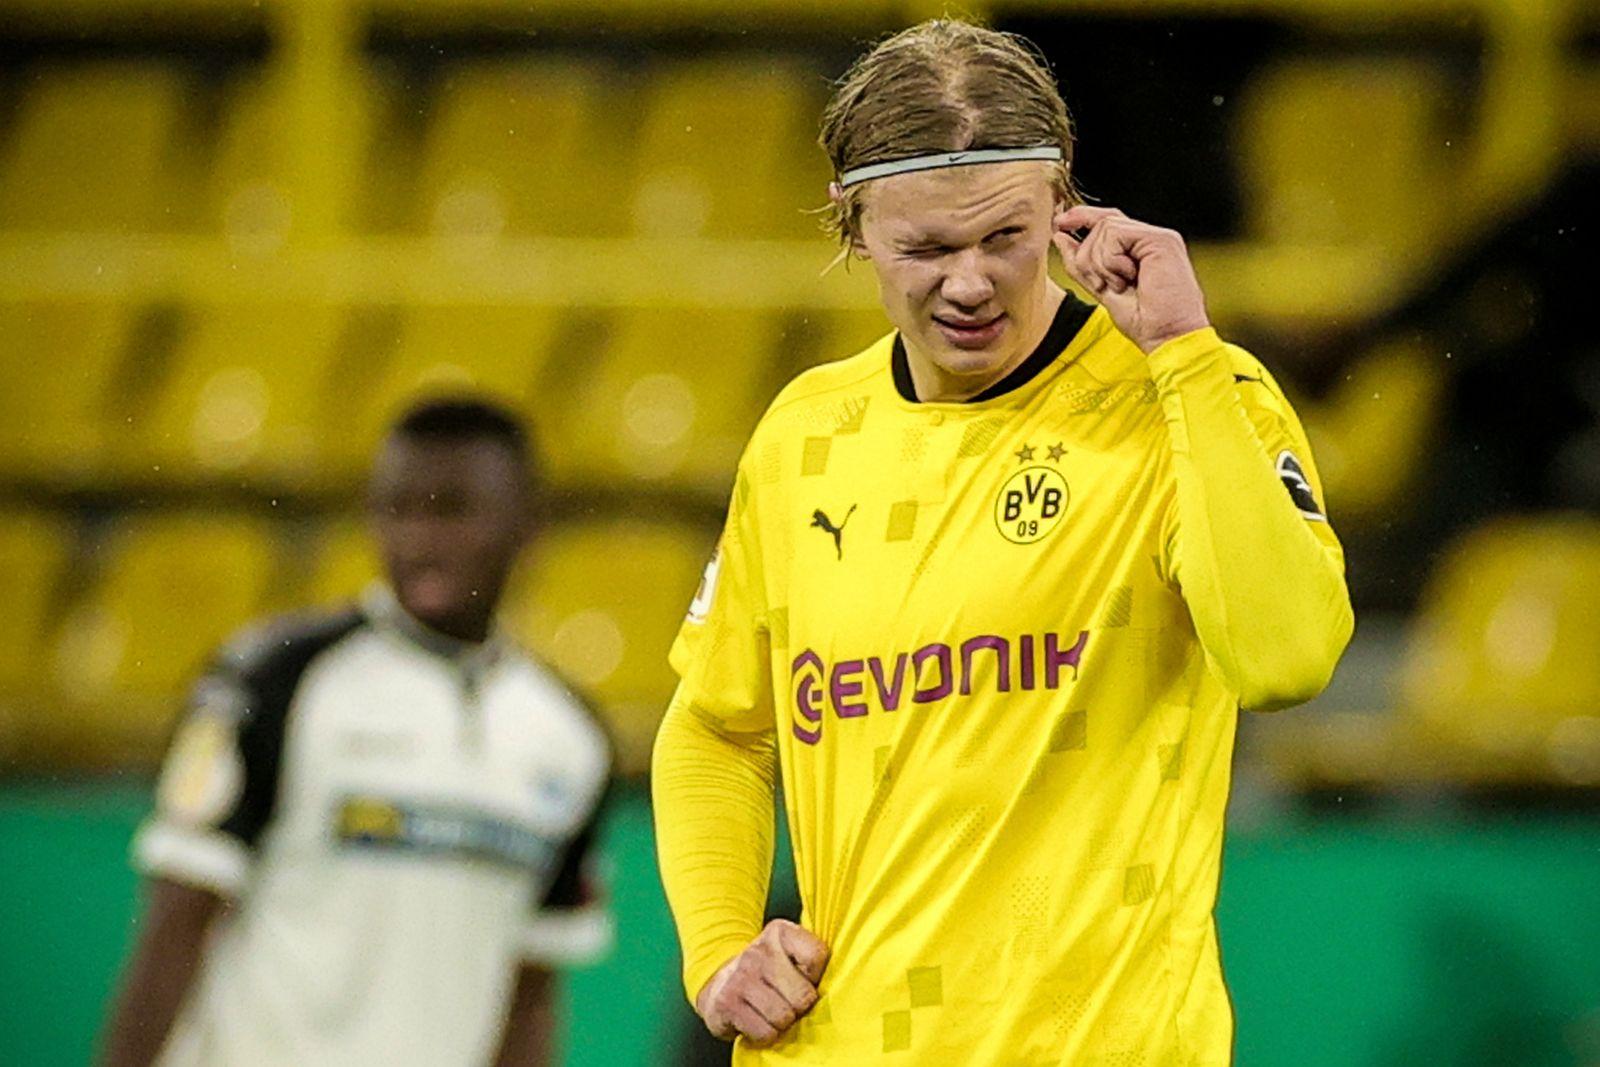 Borussia Dortmund vs SC Paderborn 07, Germany - 02 Feb 2021